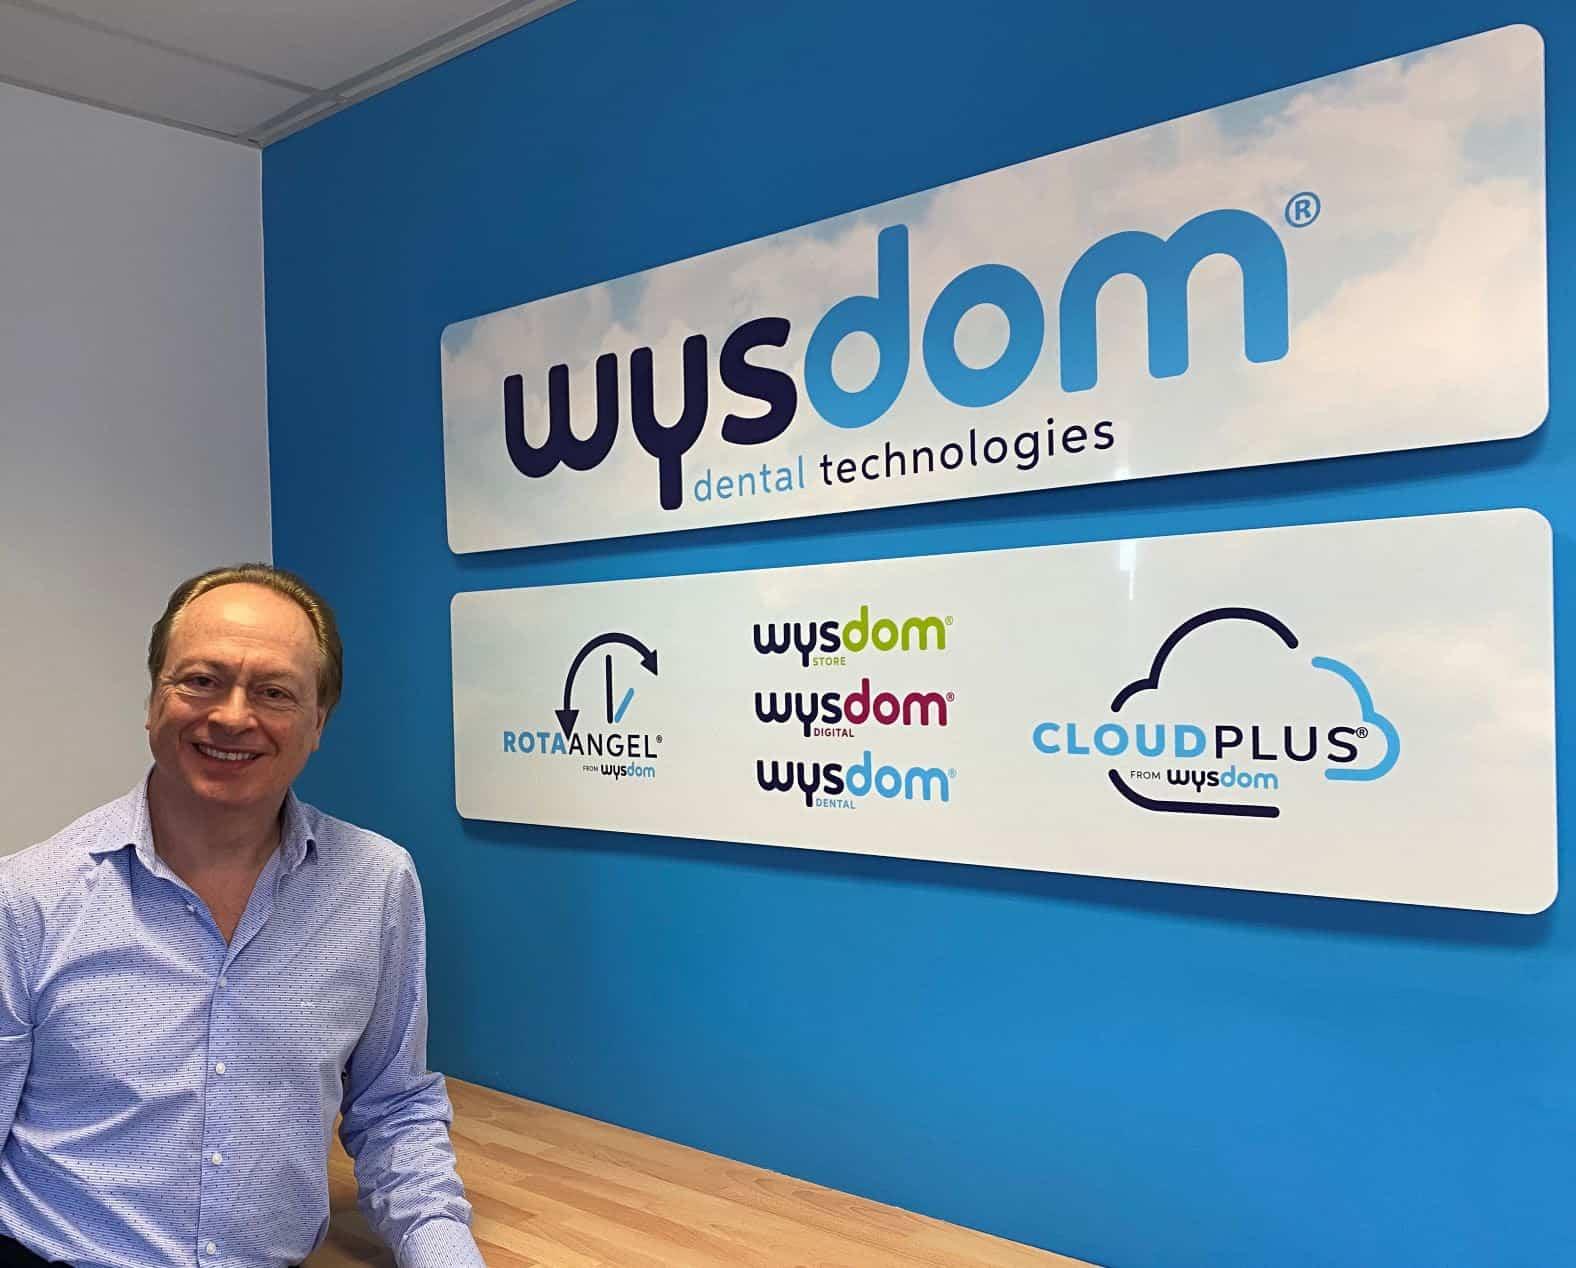 Wysdom Dental Technologies secures £200k Debt financing from Maven